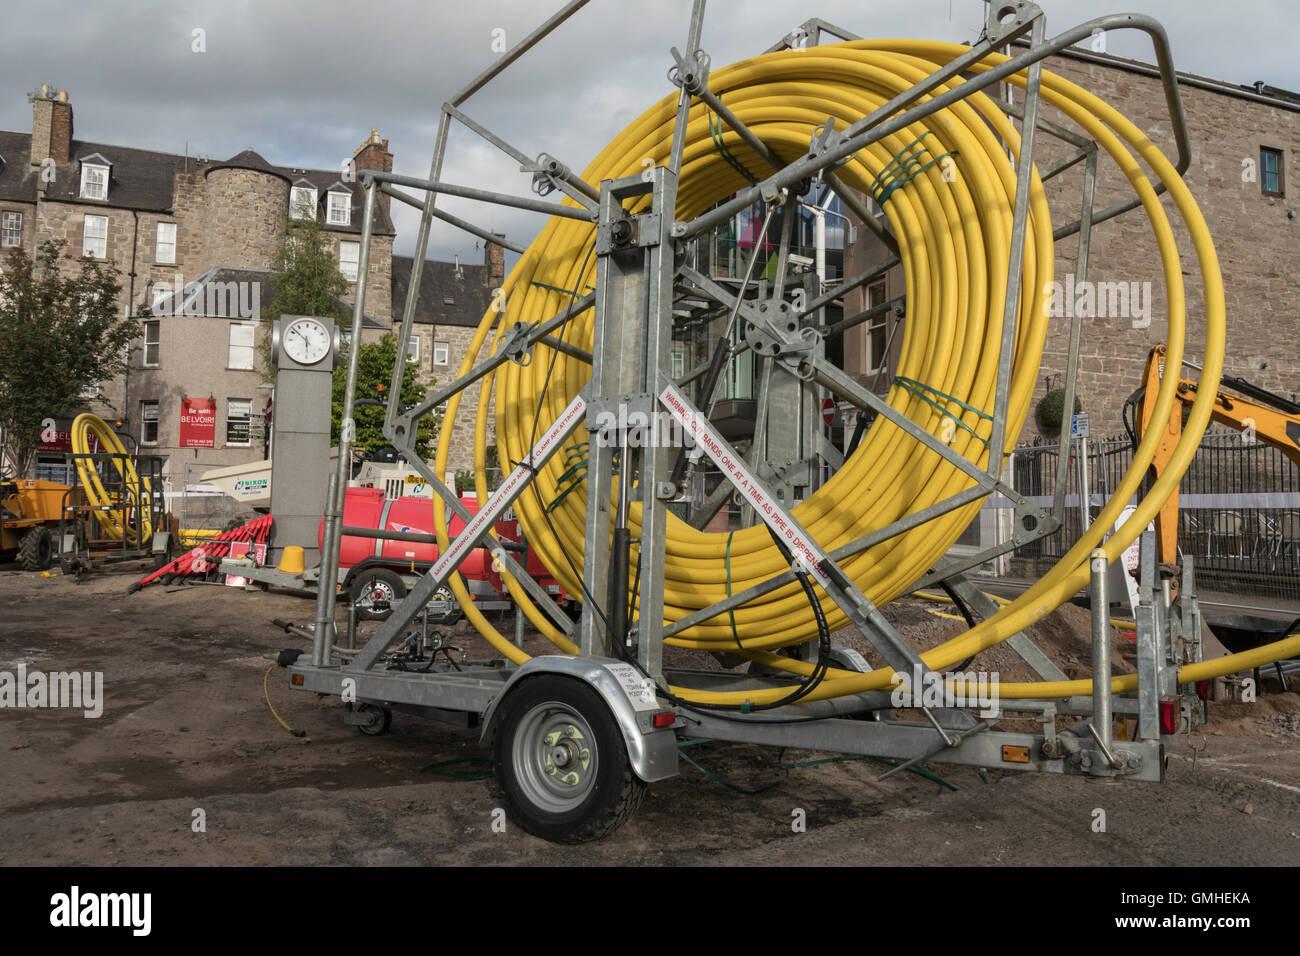 Public realm improvement works at Horsecross,Perth,Perthshire,Scotland,UK, - Stock Image